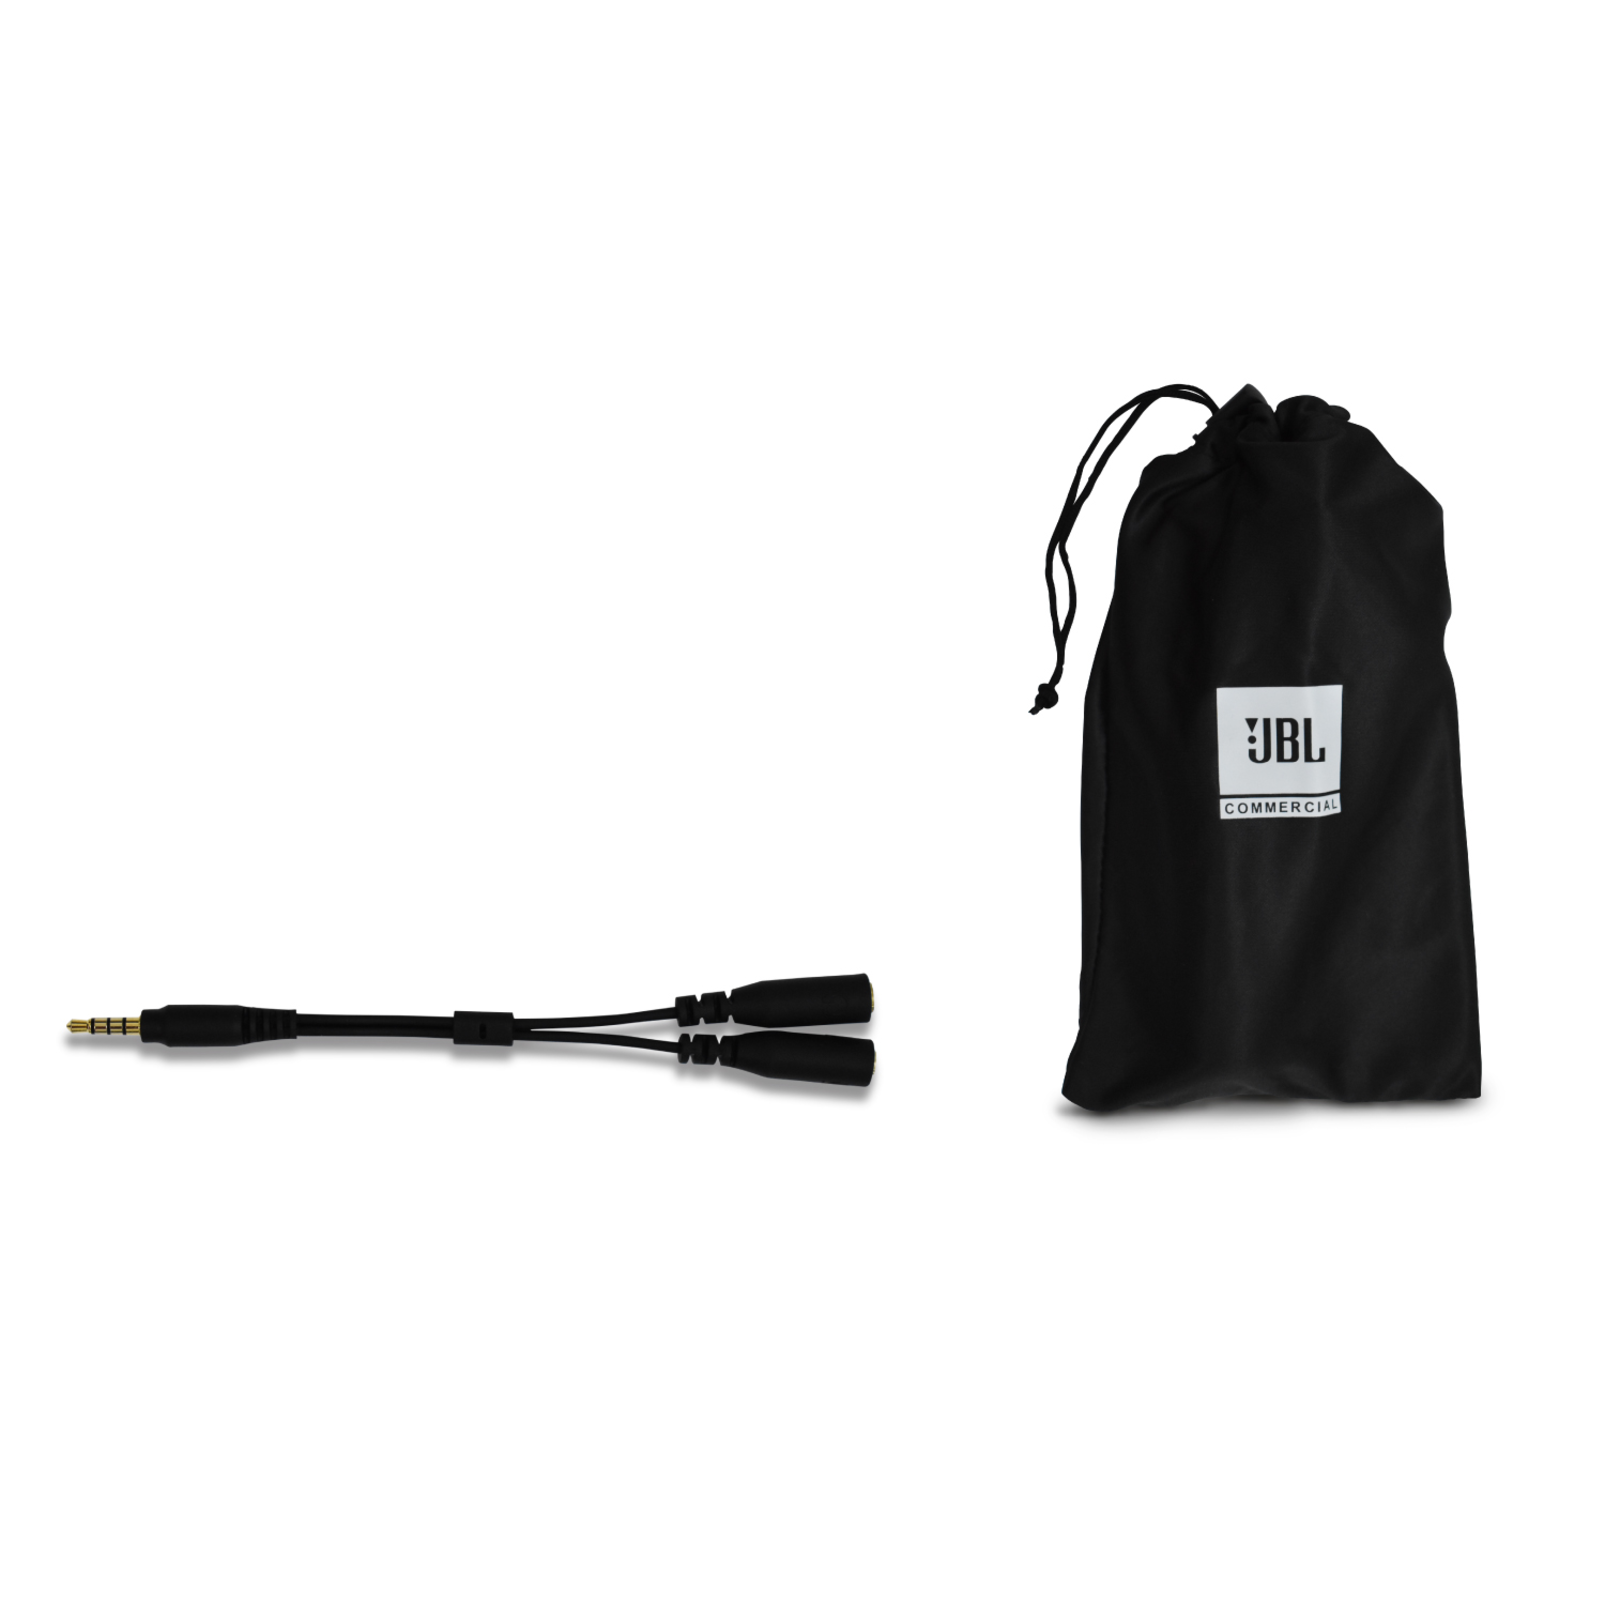 CSSG20 - Black - On-Camera Shotgun Microphone - Detailshot 4